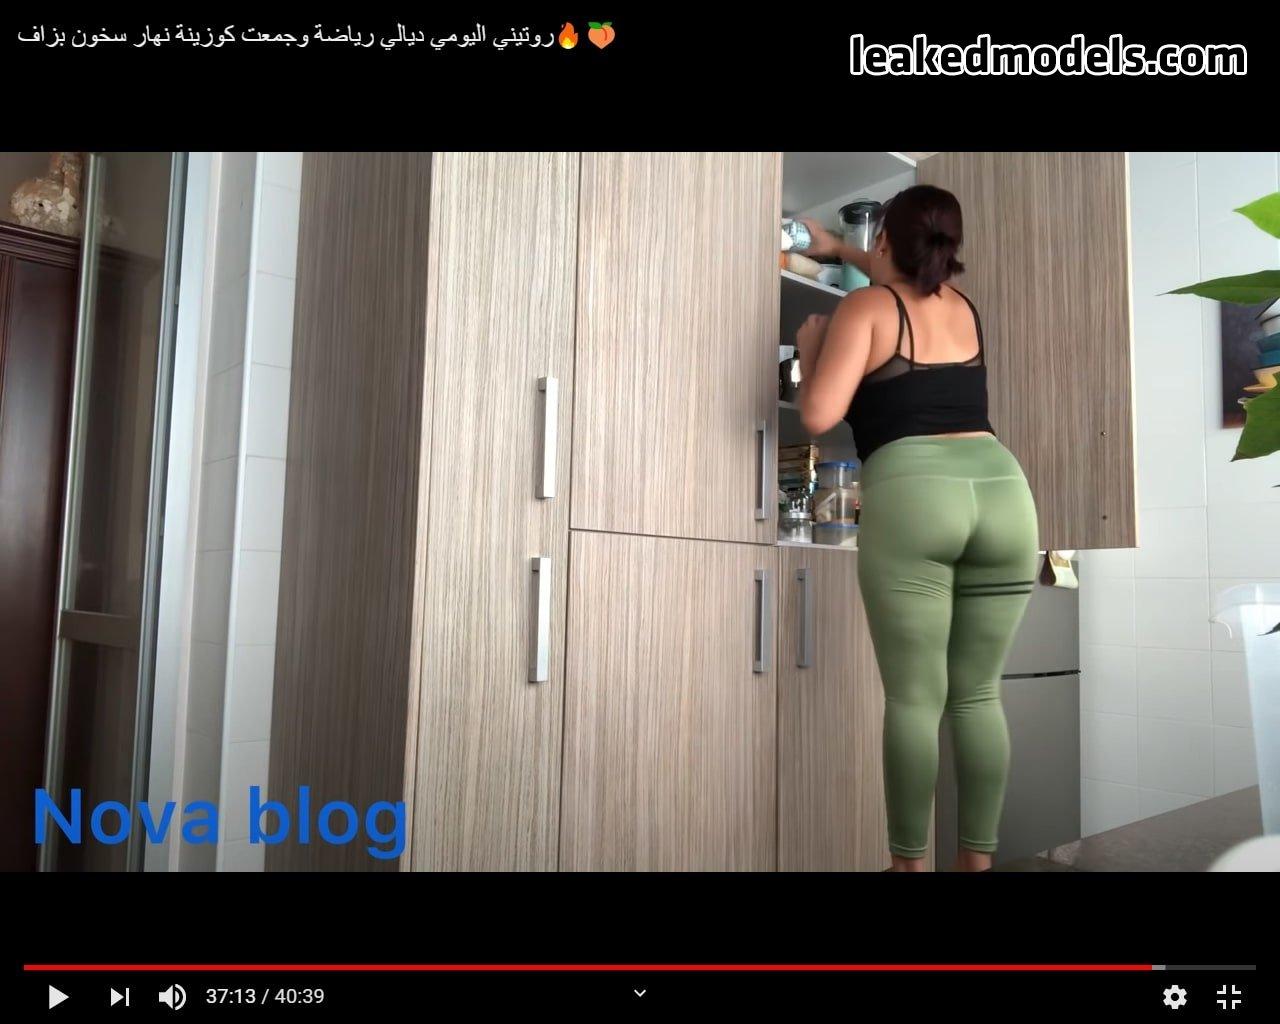 Nova blogs Instagram Sexy Leaks (17 Photos)